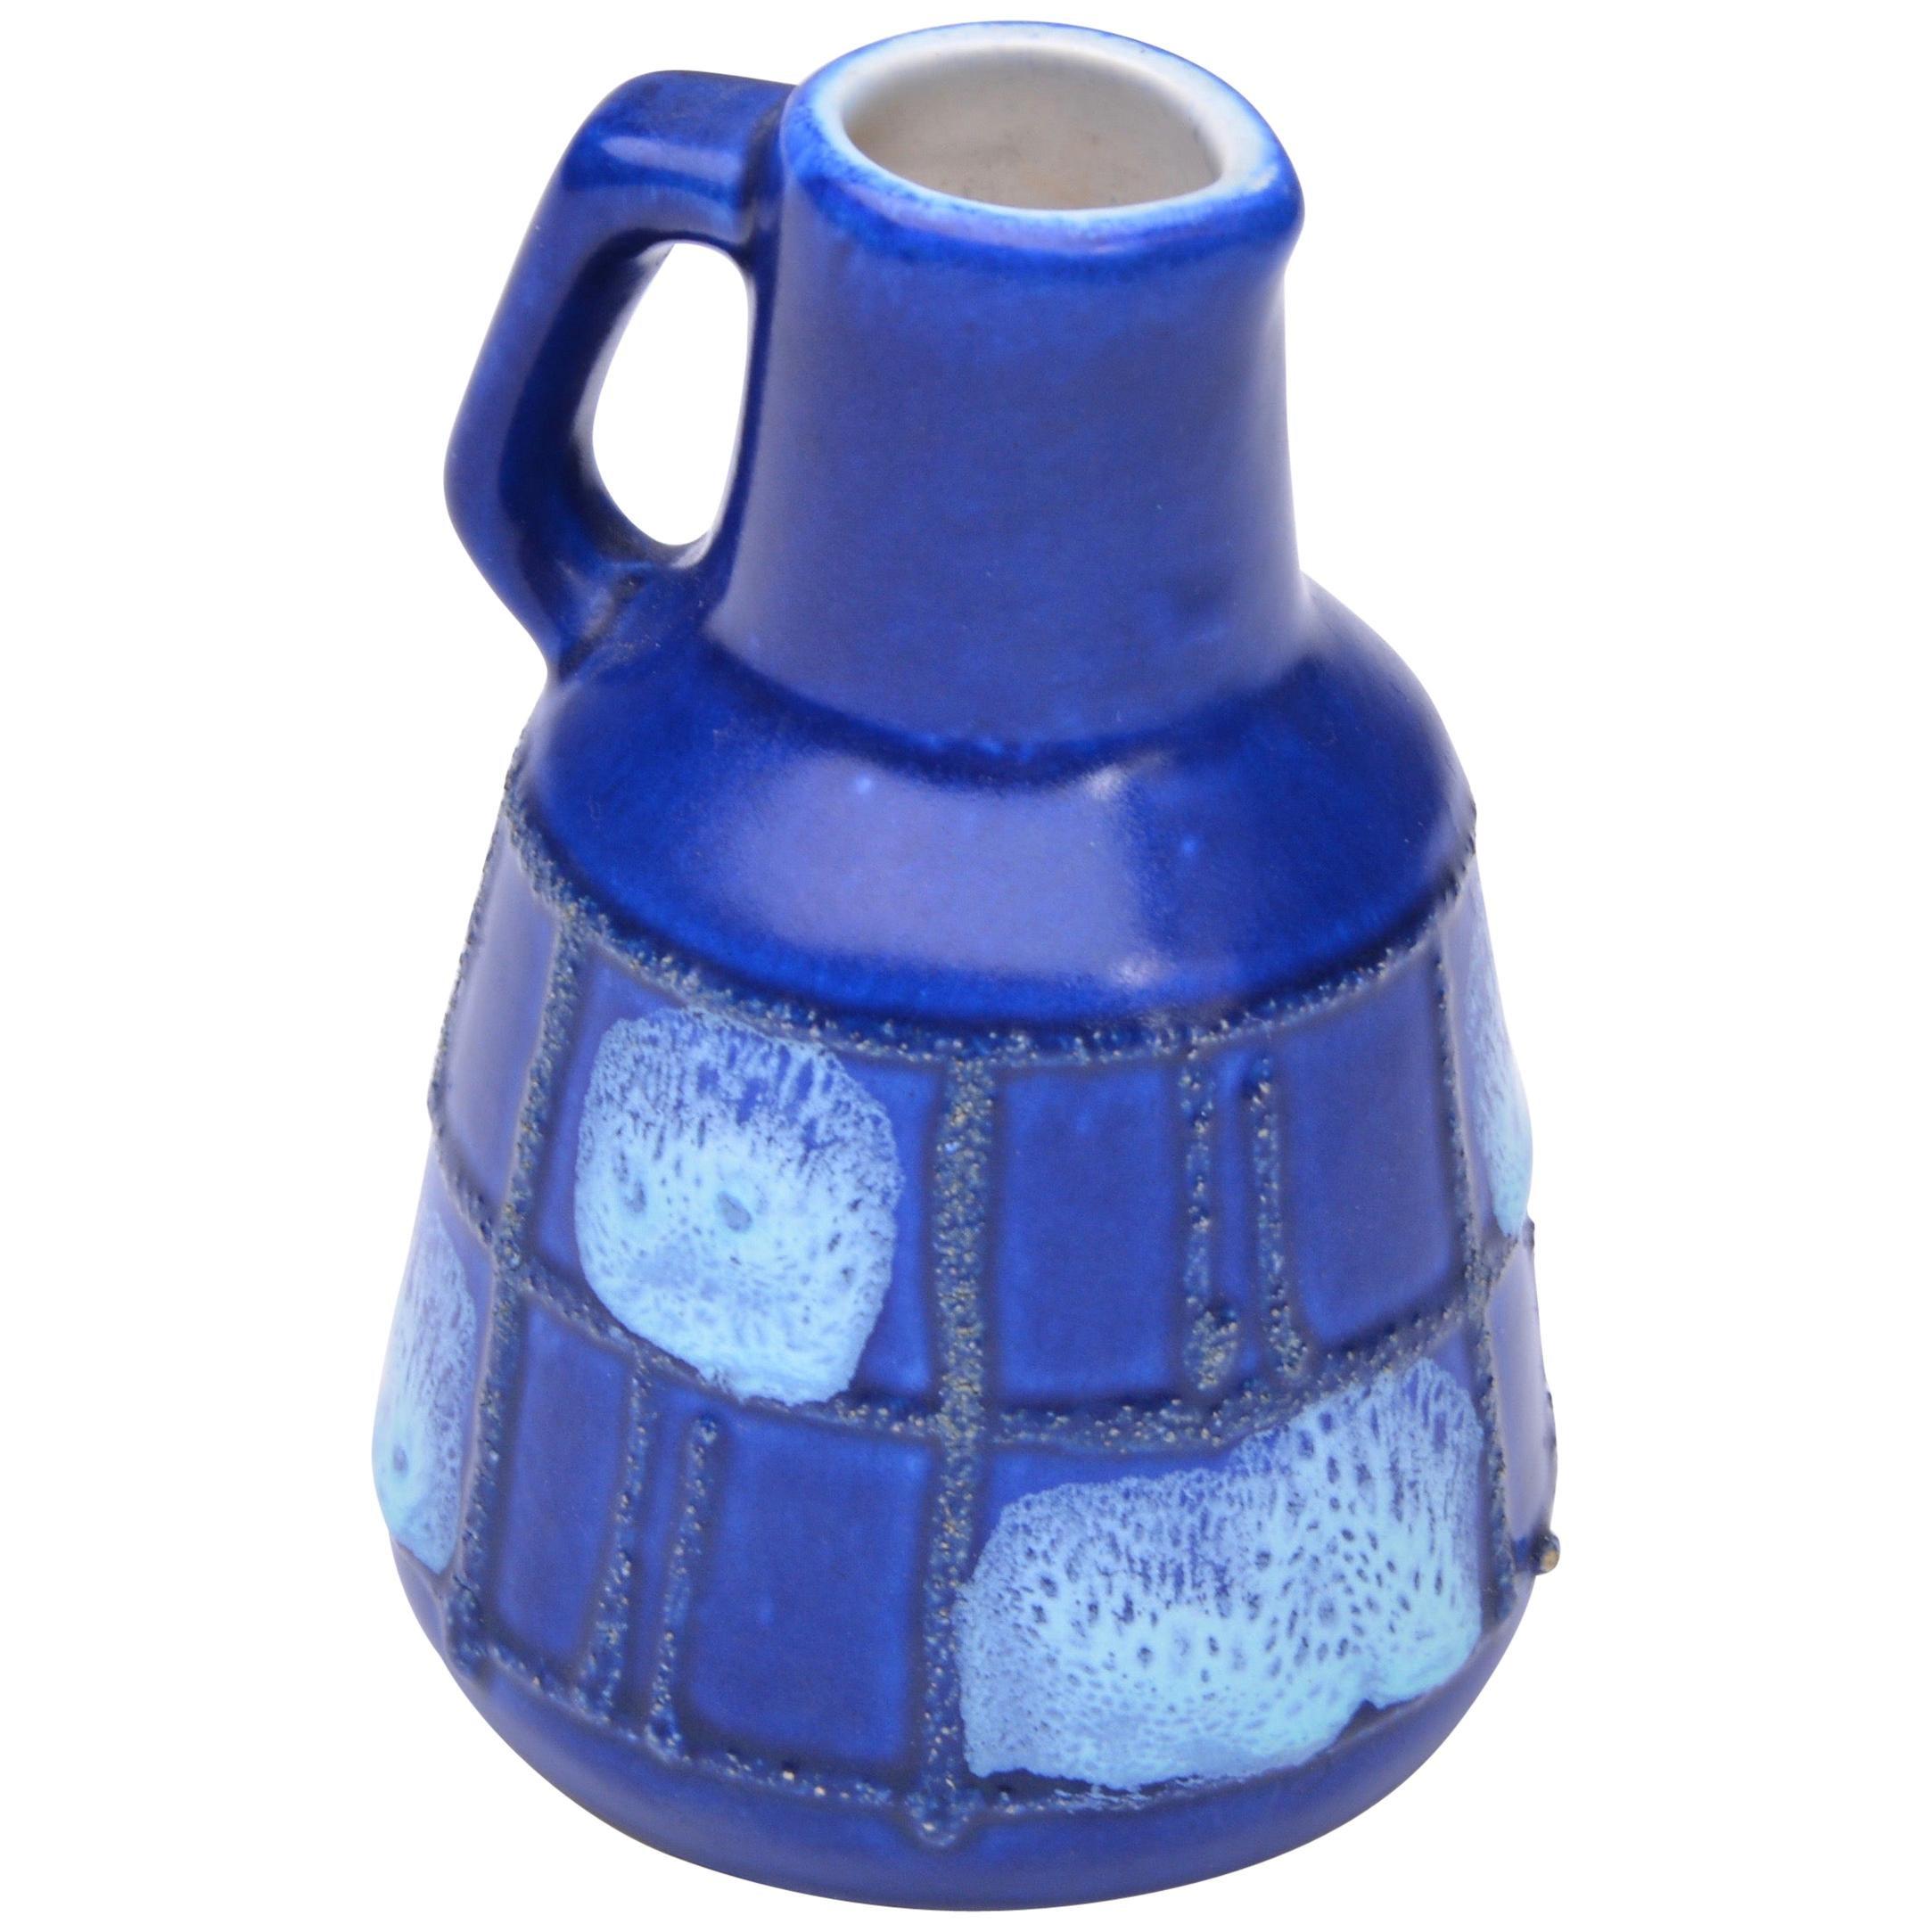 Small Blue Ceramic Vase by Strehla Keramik, 1950s